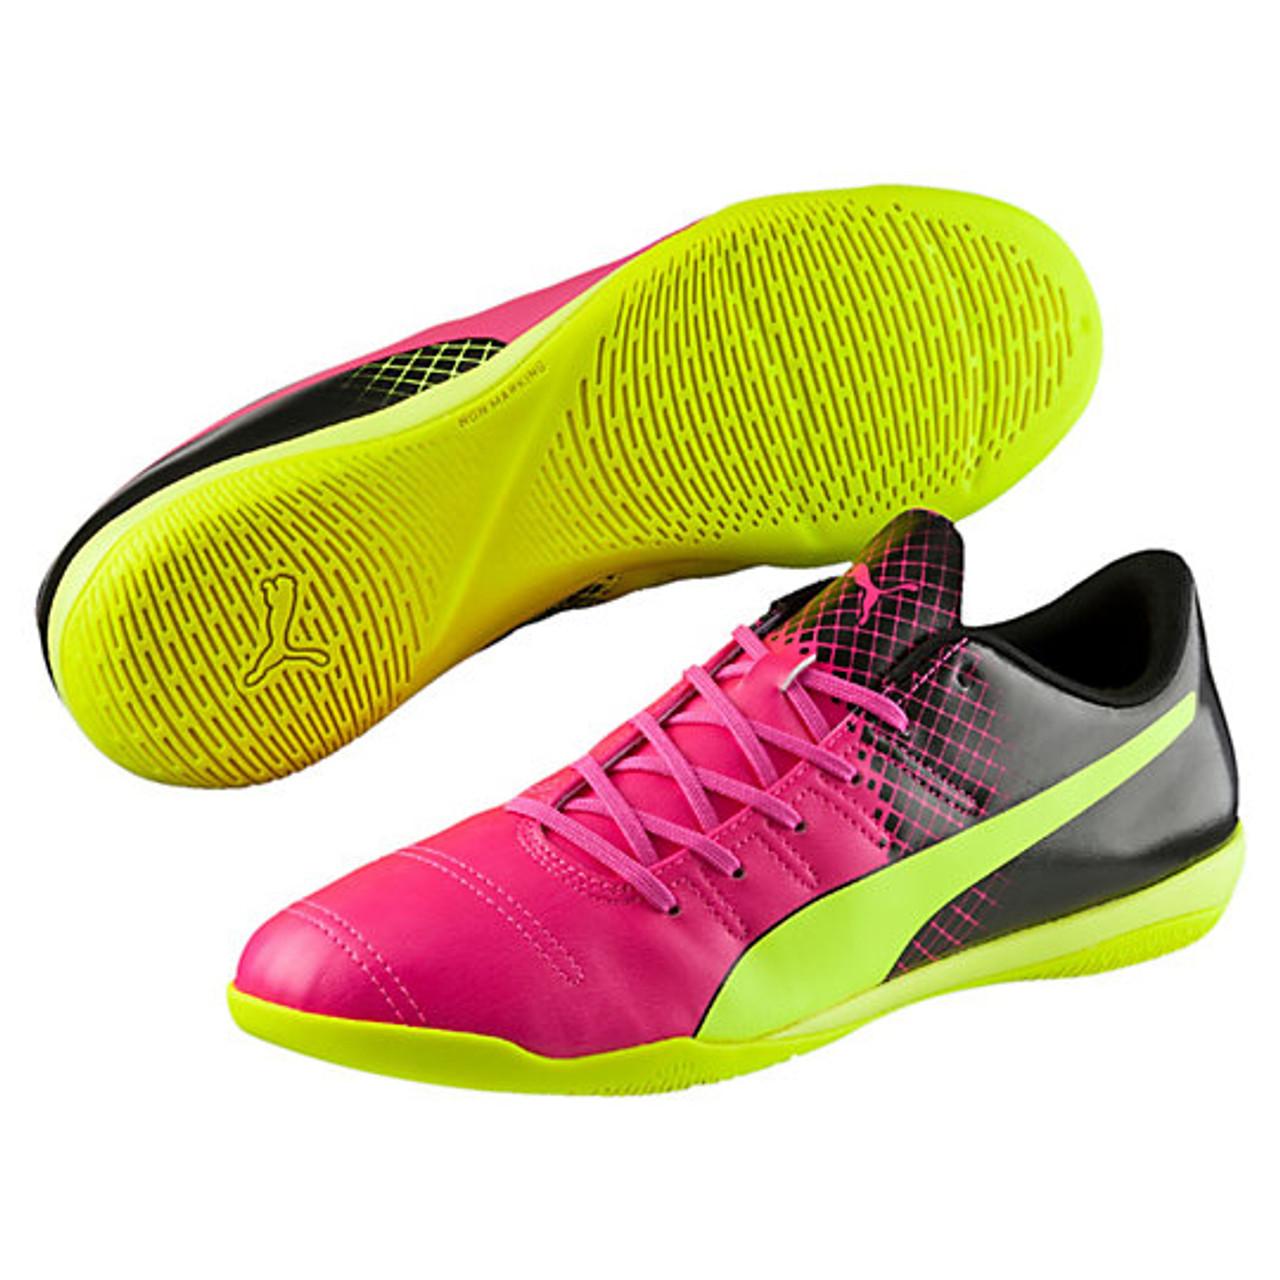 d5537d9b7 PUMA EVOPOWER 4.3 TRICKS Junior indoor soccer shoes - Soccer Plus